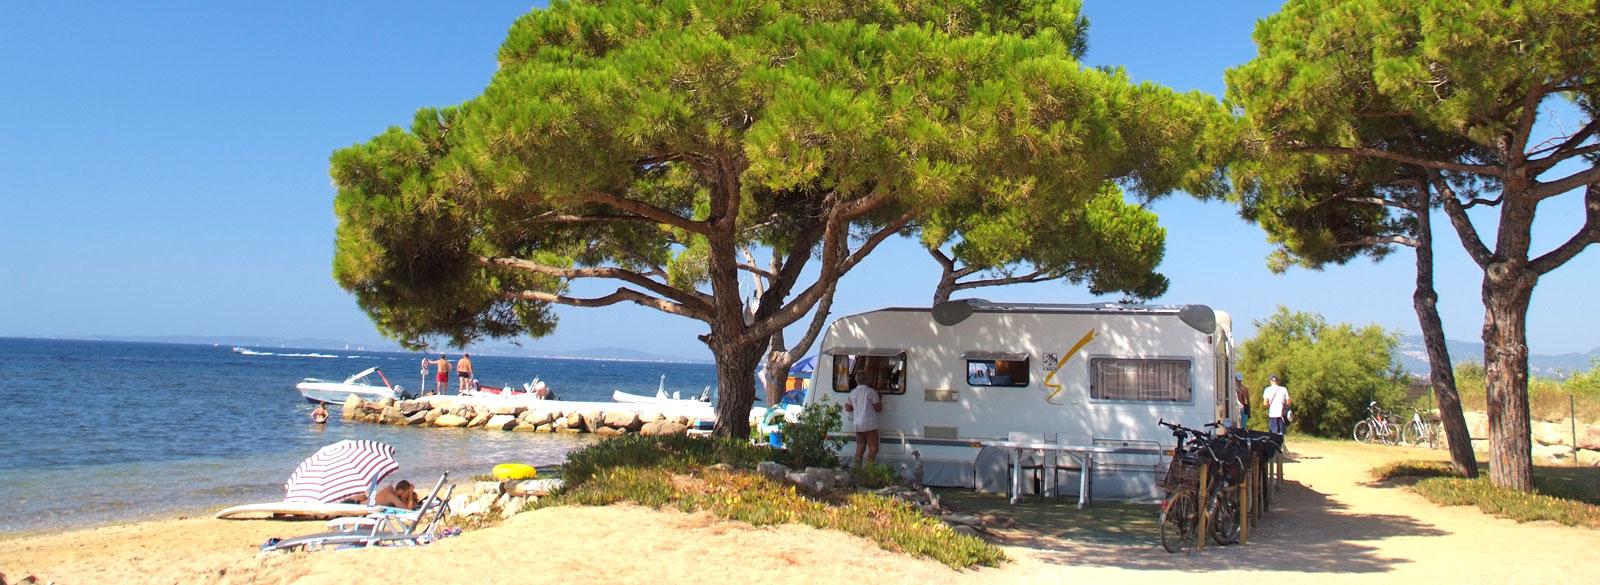 campingplatz bormes les mimosas